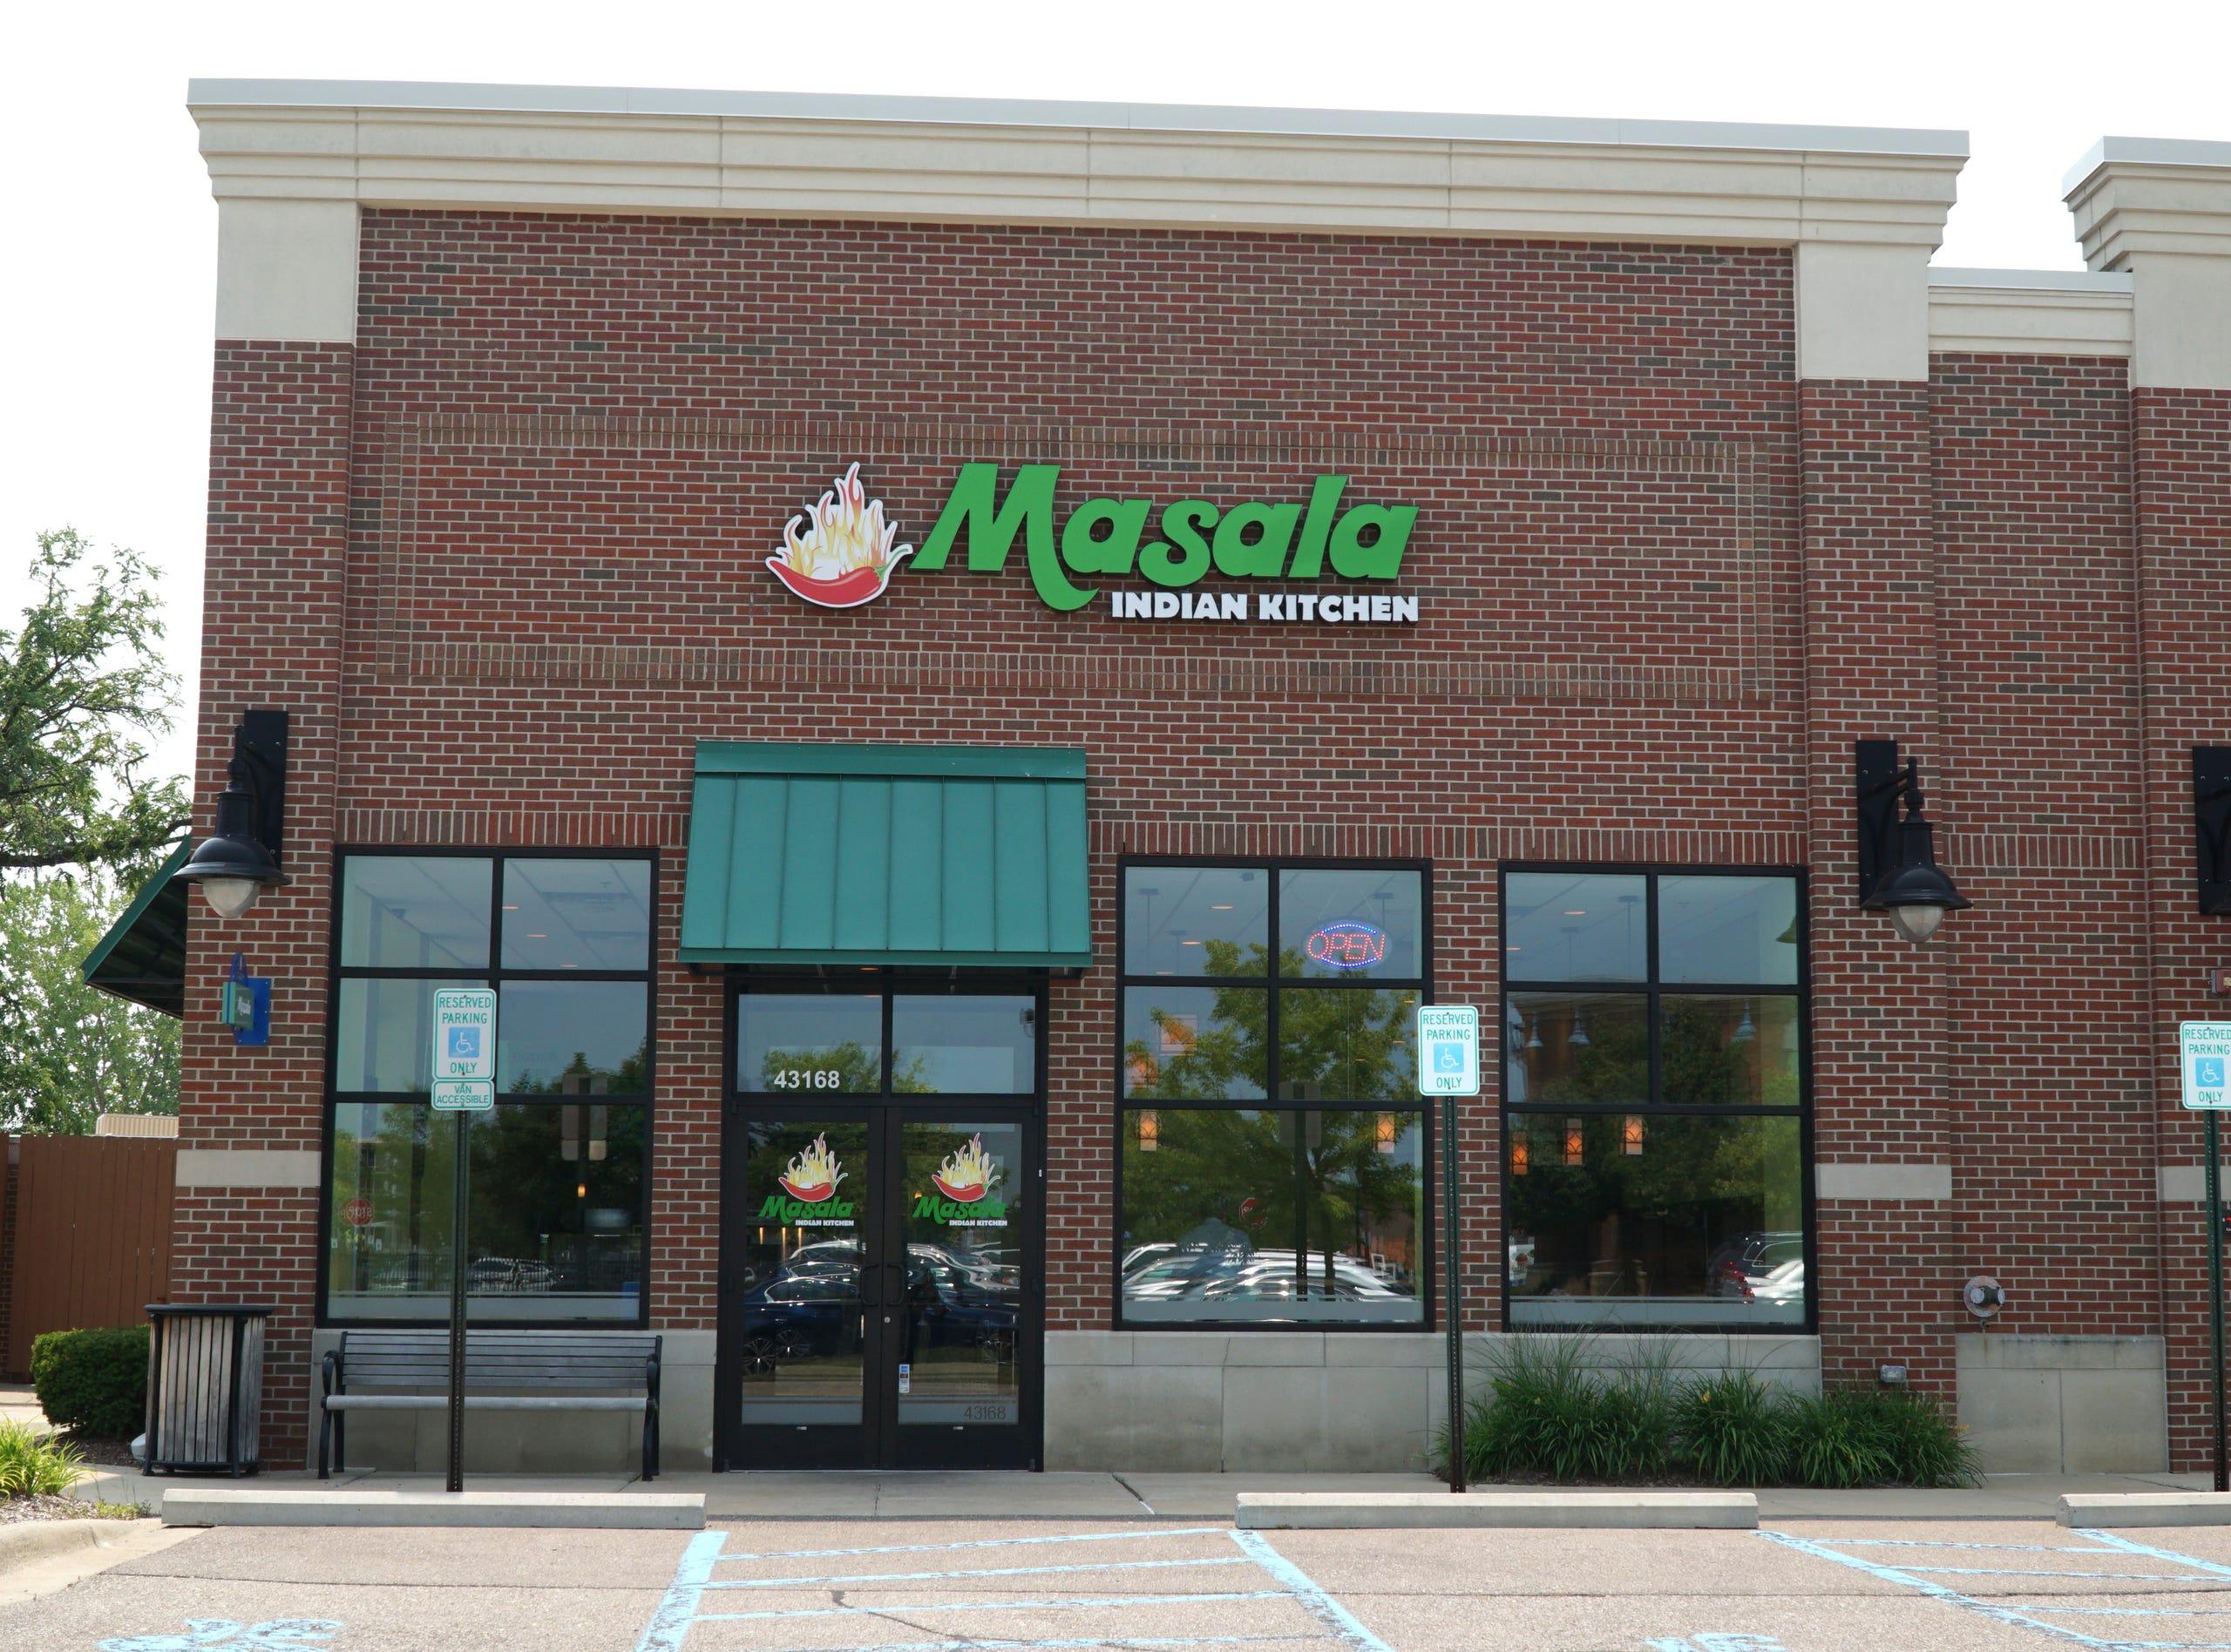 Novi S Masala Indian Kitchen Opens In Novi Town Center